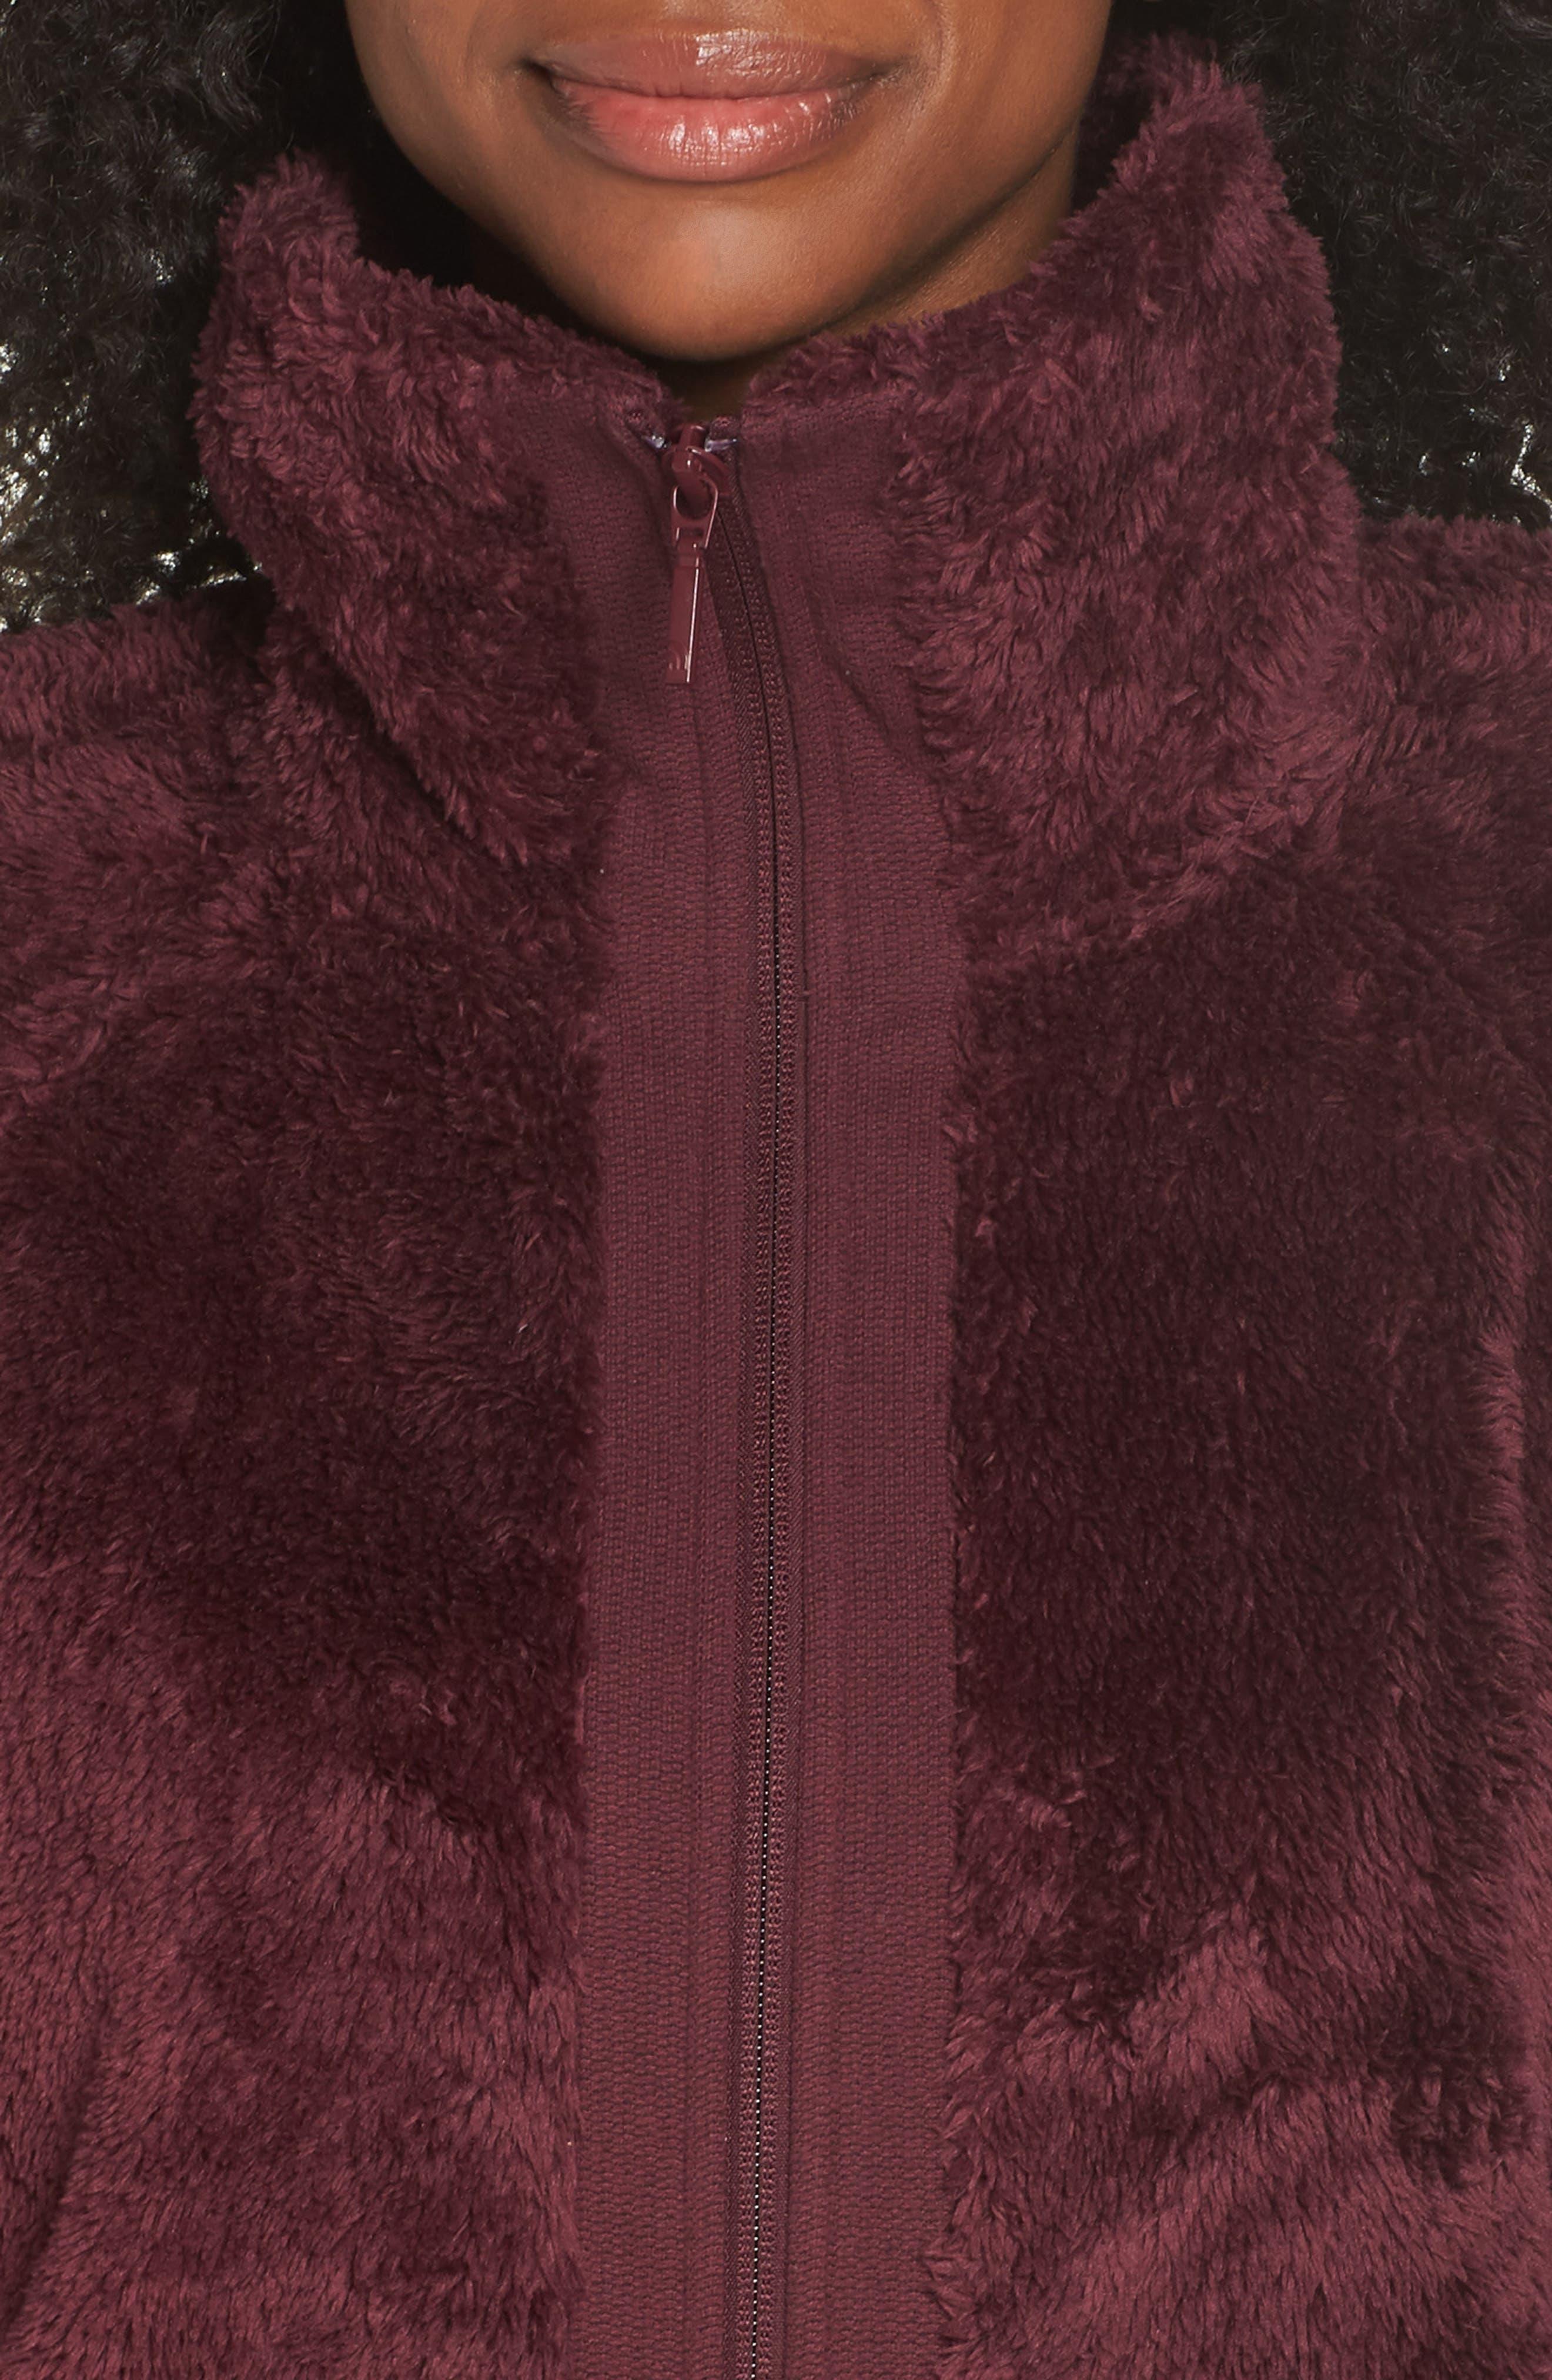 Furry Fleece Jacket,                             Alternate thumbnail 27, color,